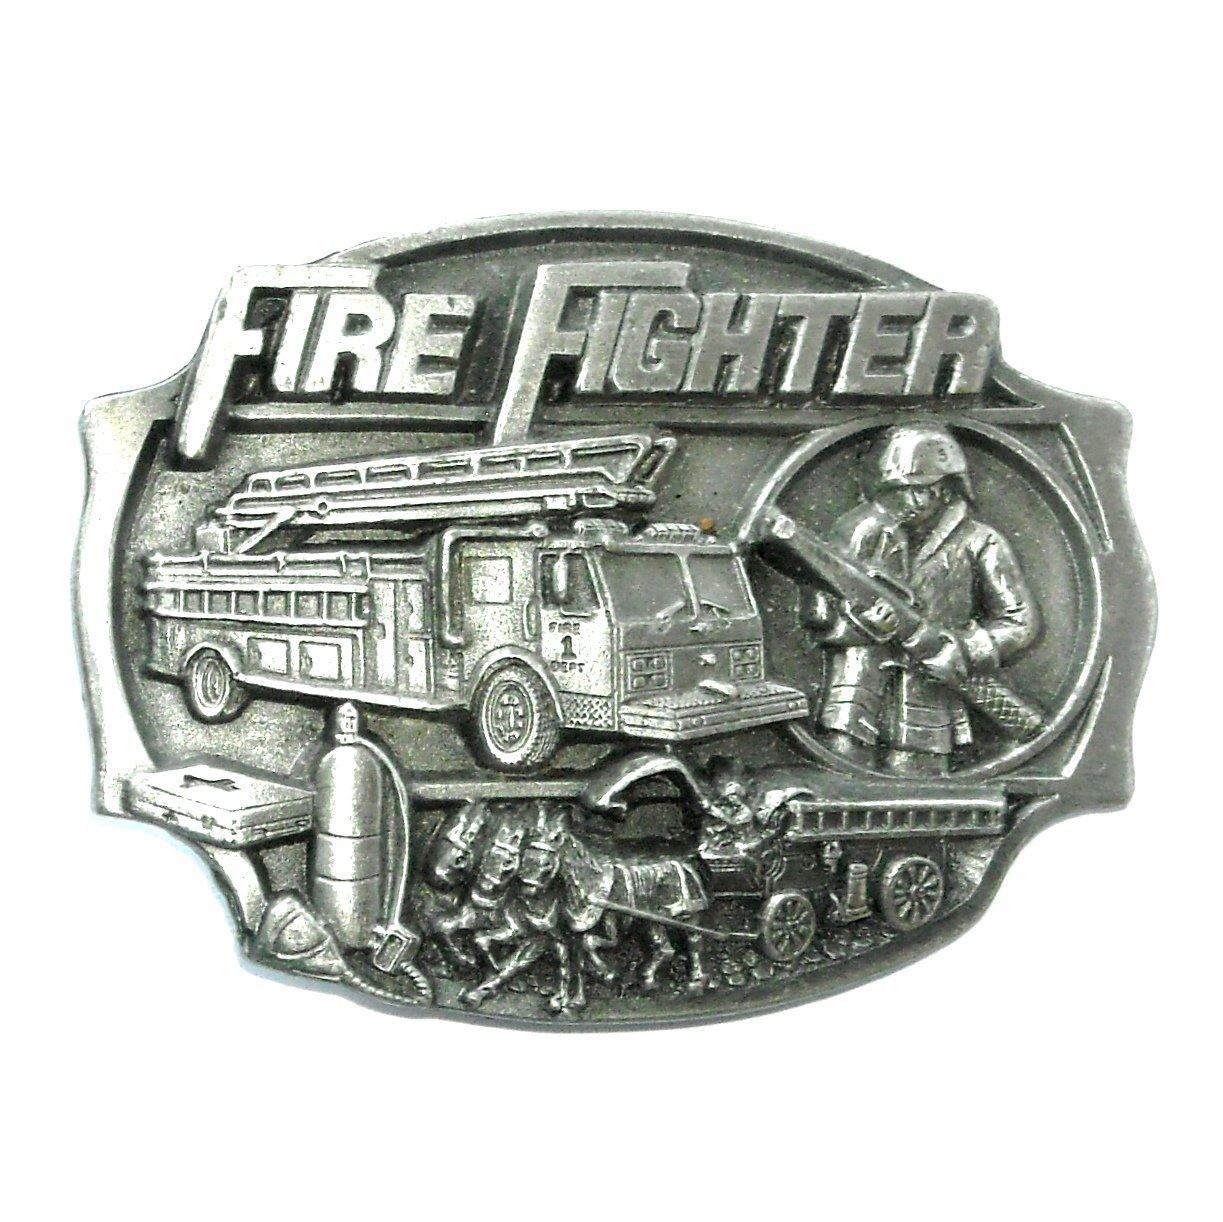 FireFighter Arroyo Grande Pewter NOS Belt Buckle